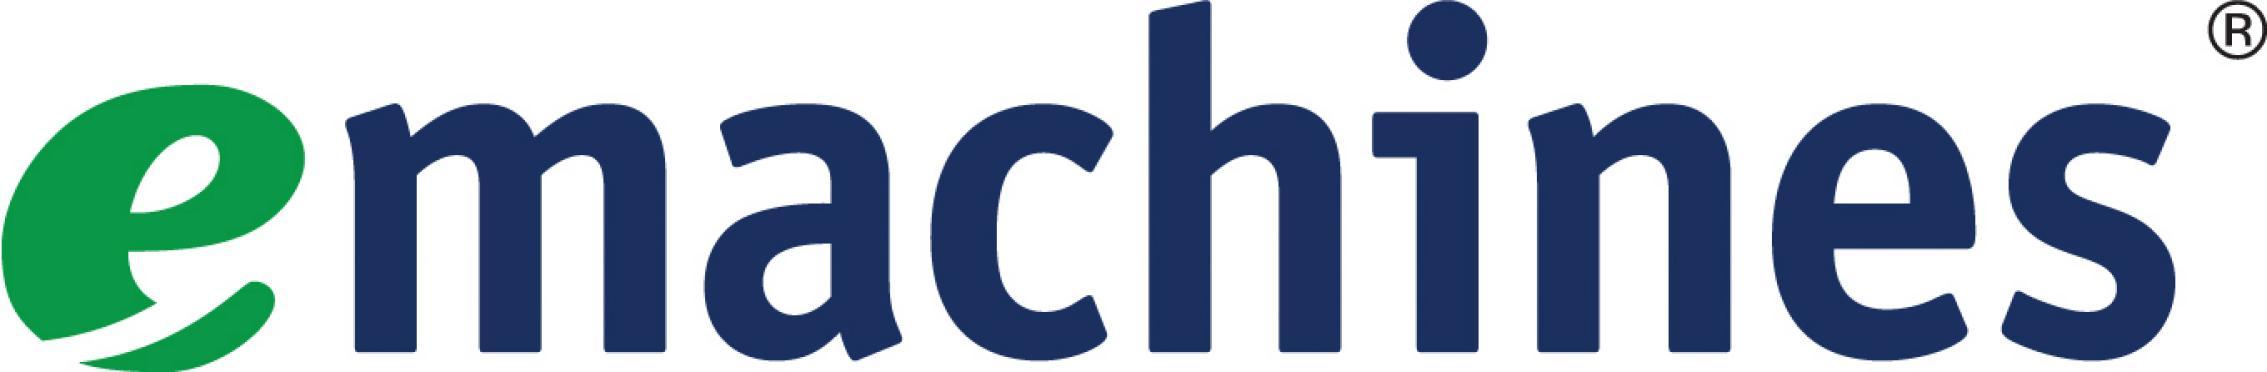 eMachines Logo [AI PDF] png